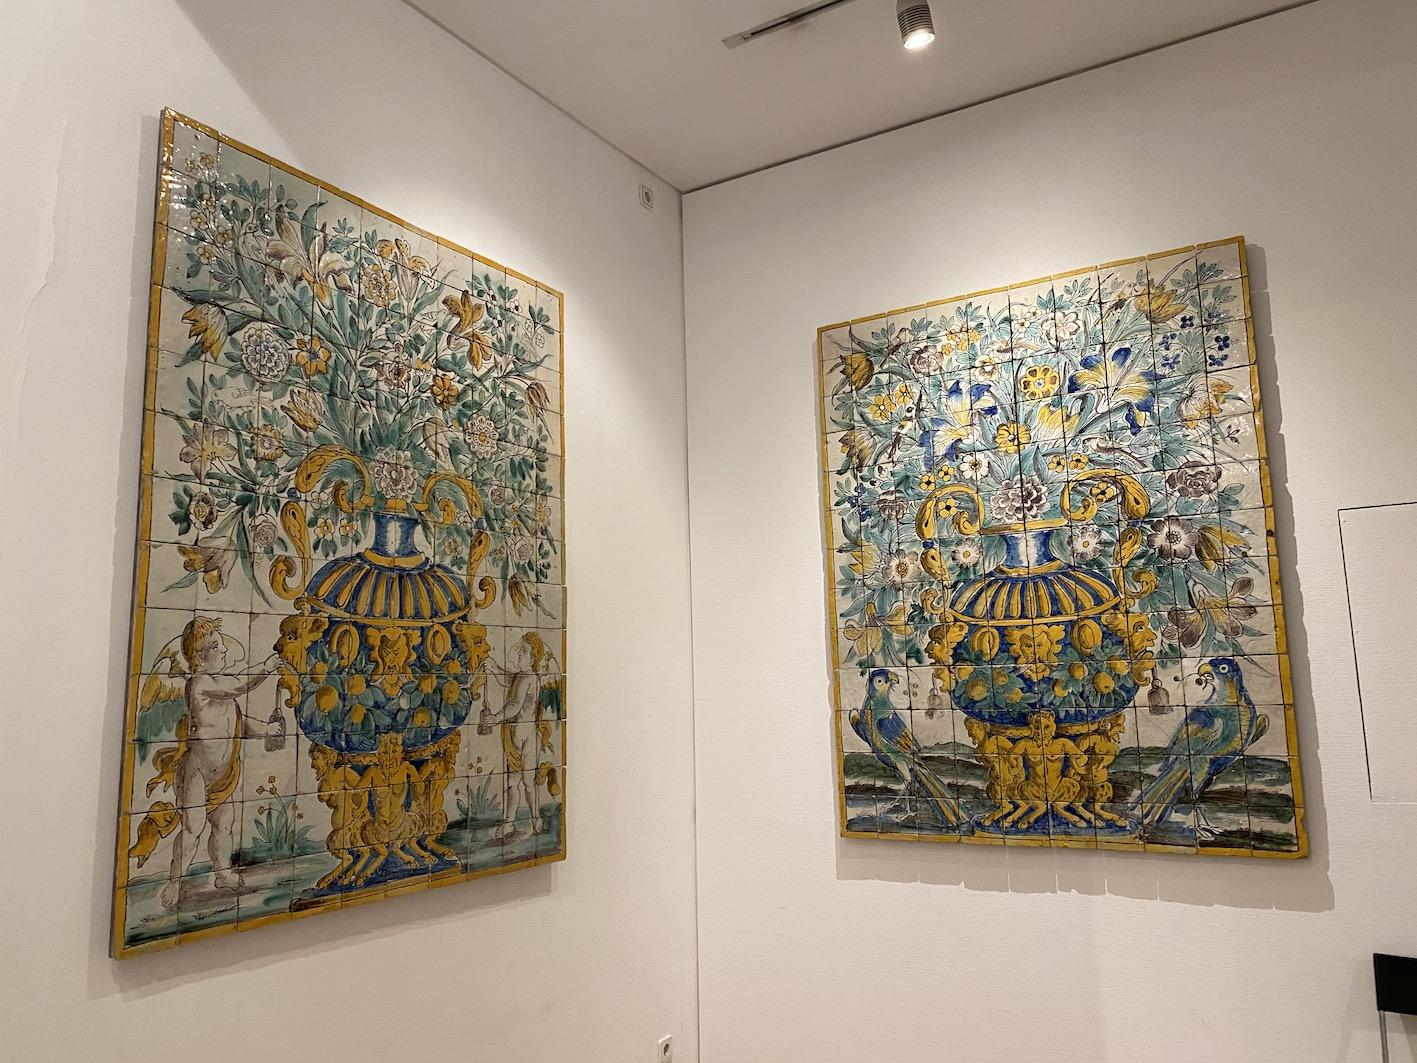 azulejos português